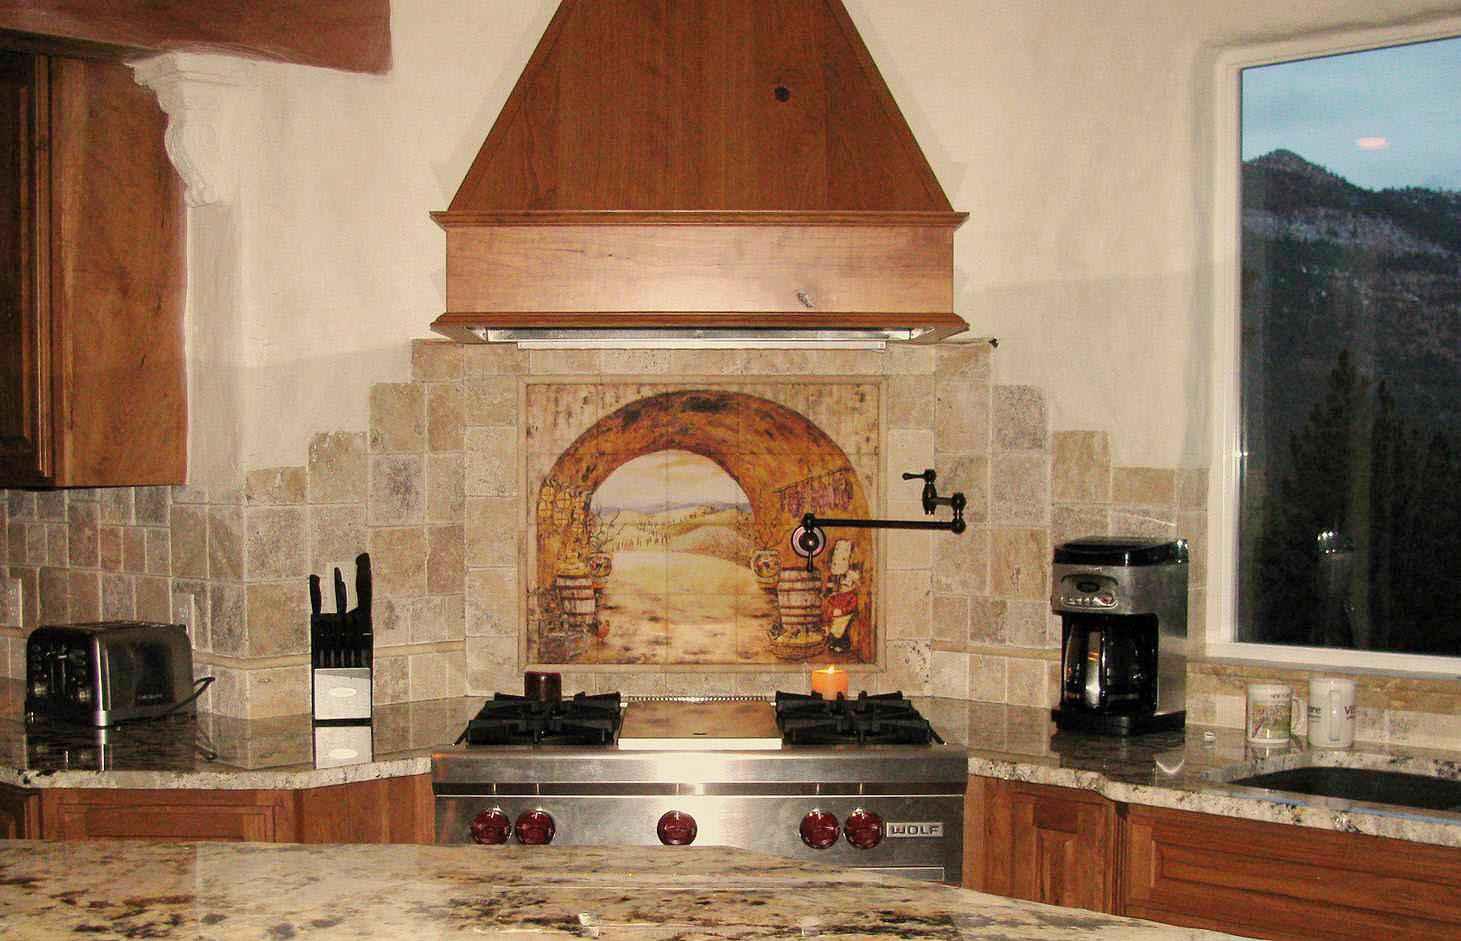 Kitchen backsplash photos. pin affordable kitchen backsplash ideas ...